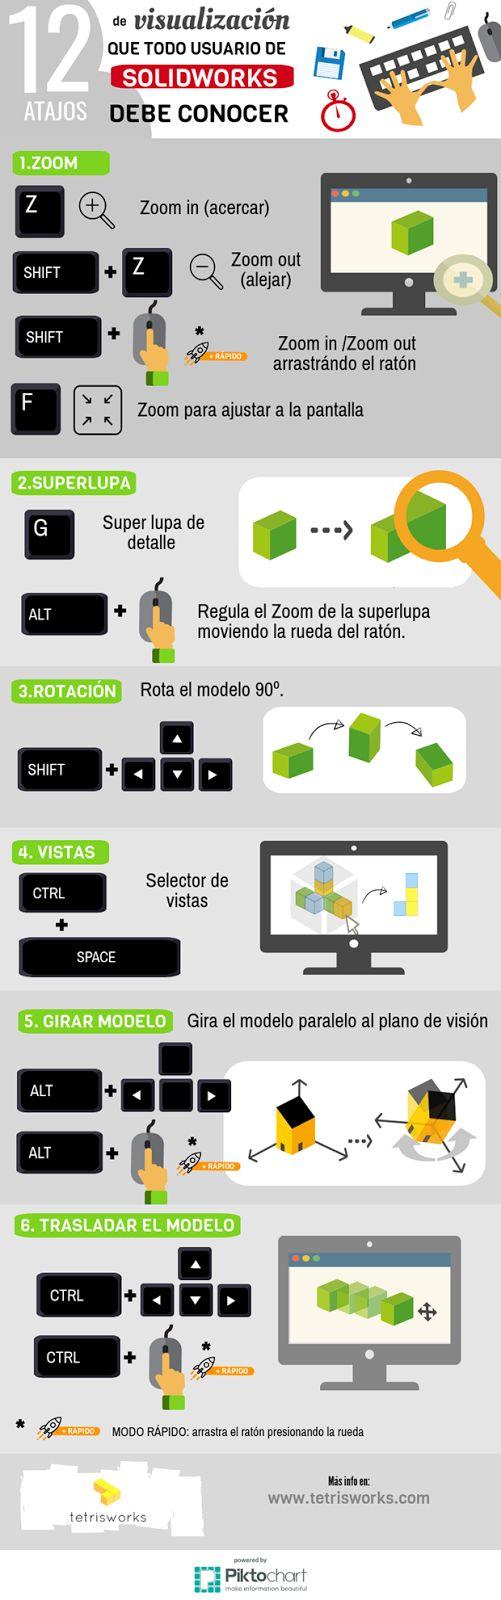 infografia 12 atajos de teclado de visualizacion usuario solidworks